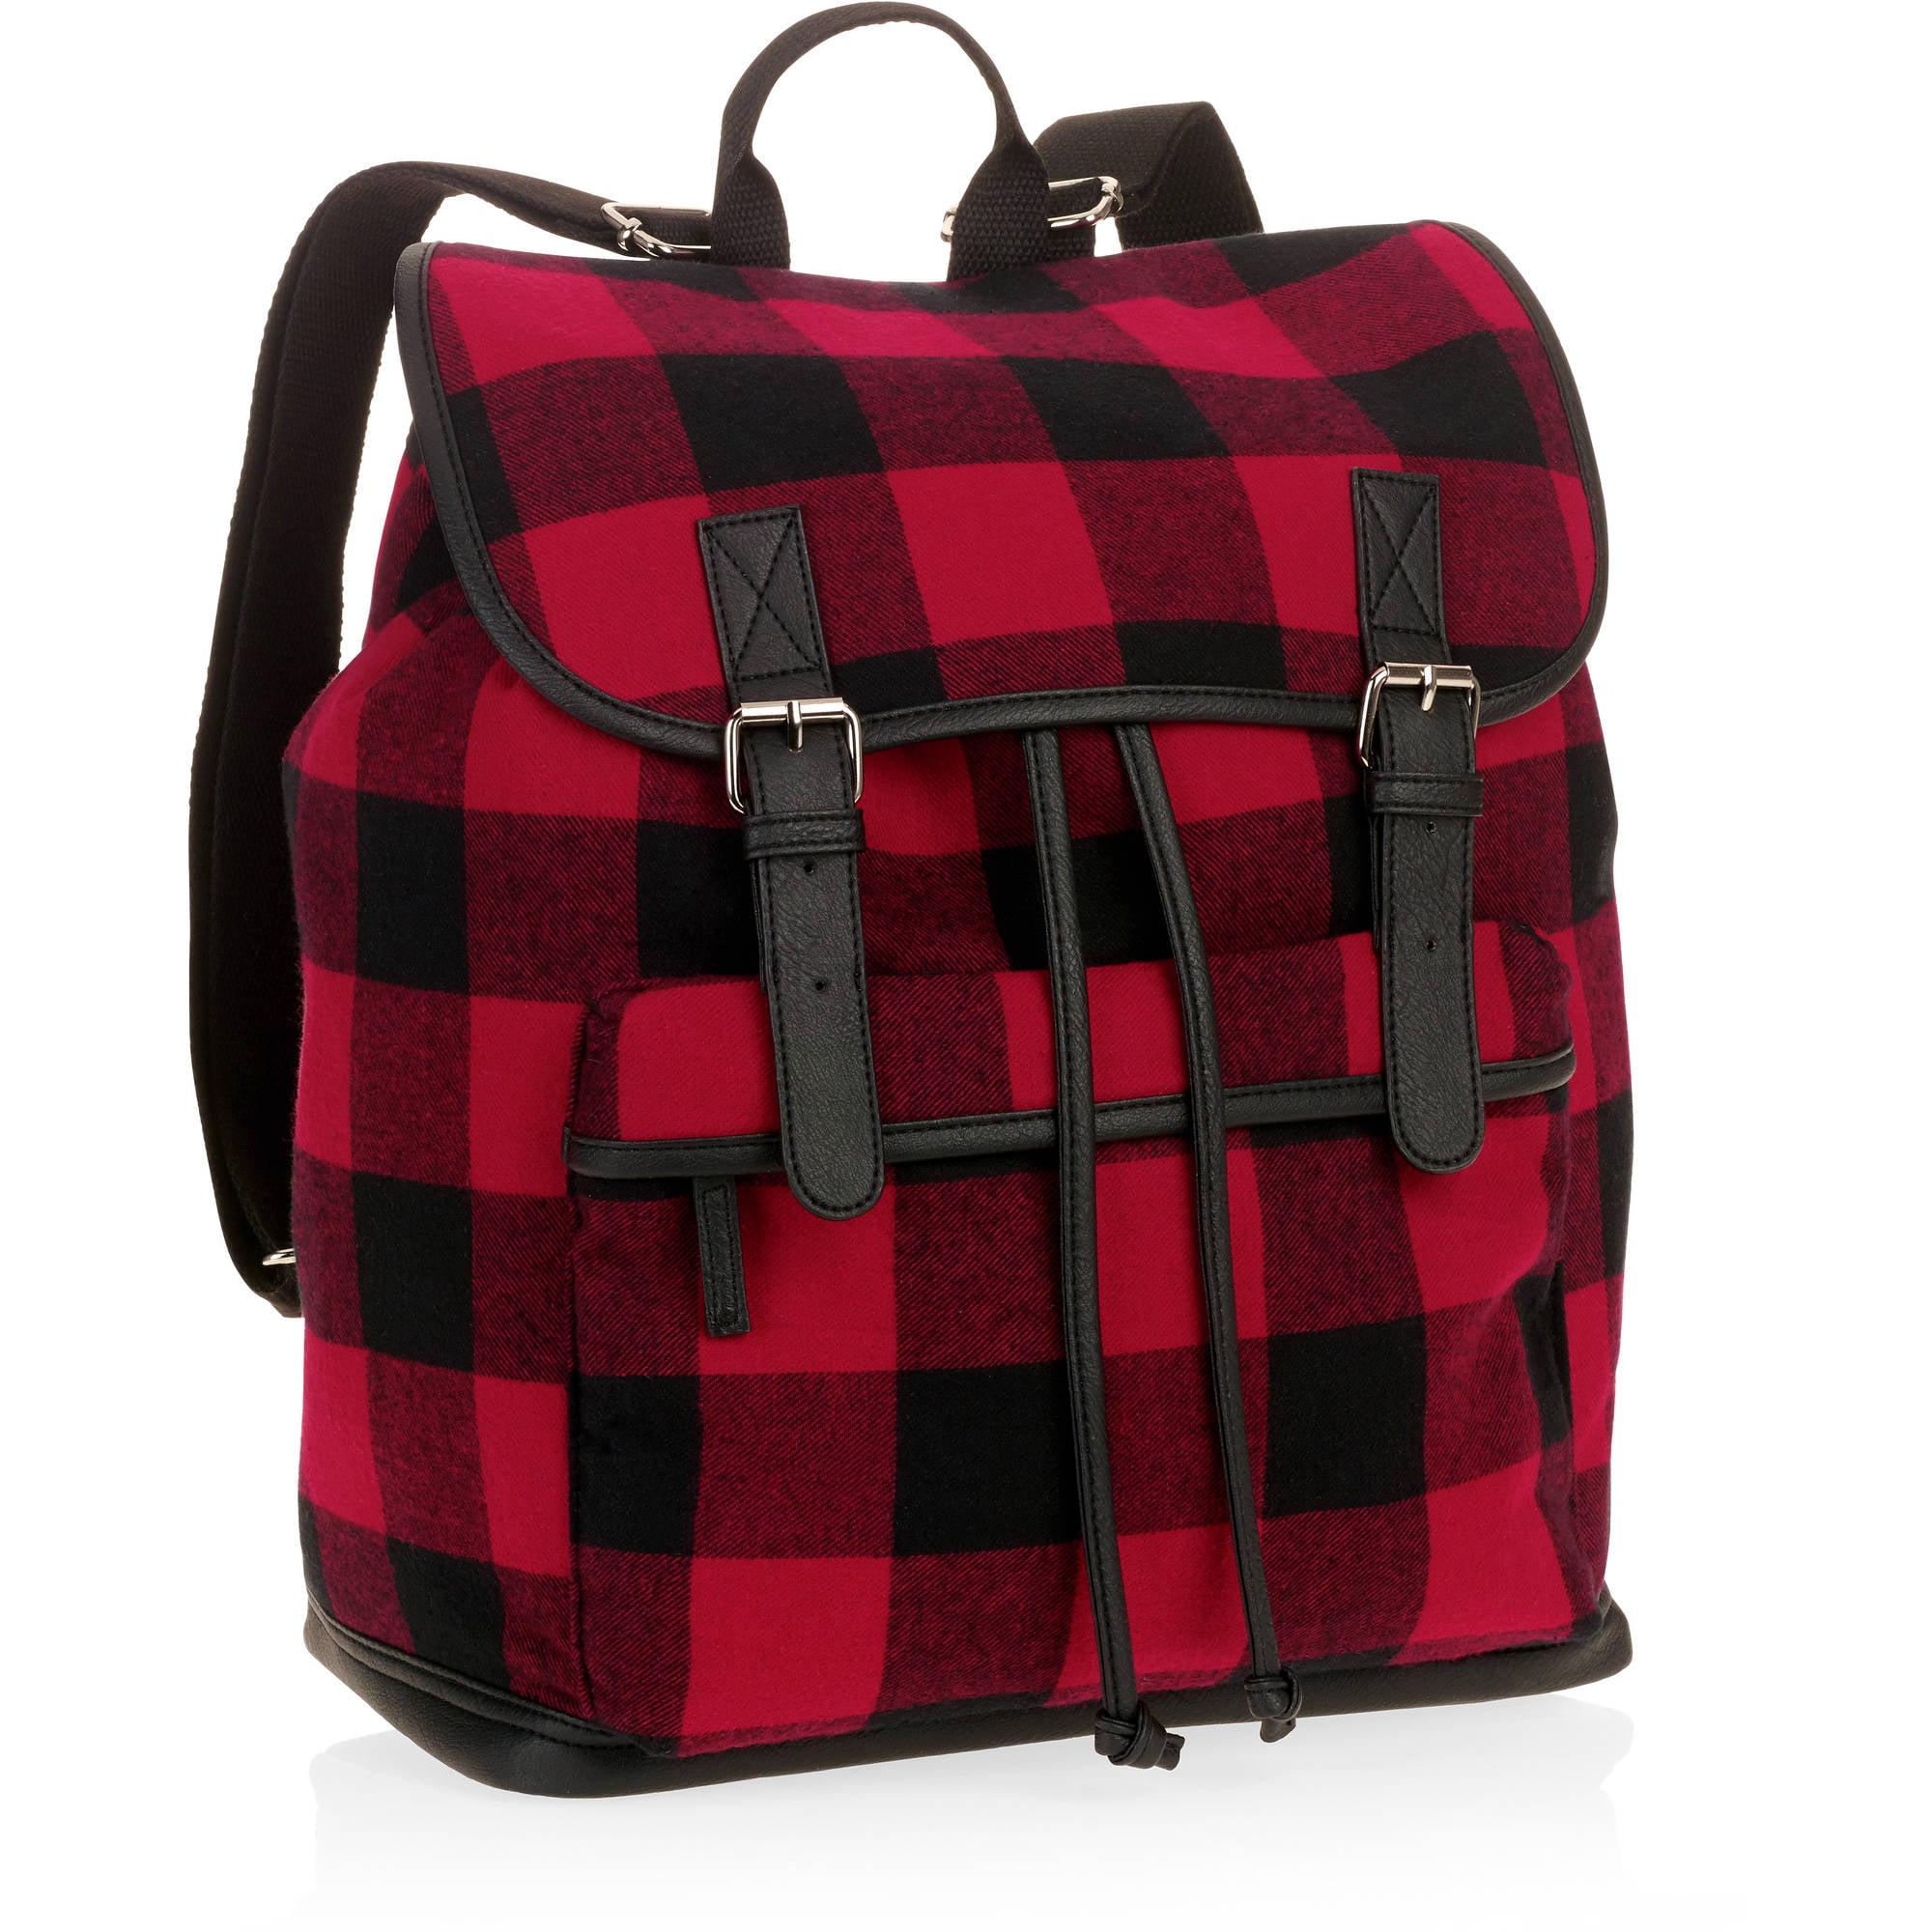 Women's Red Plaid Backpack - Walmart.com